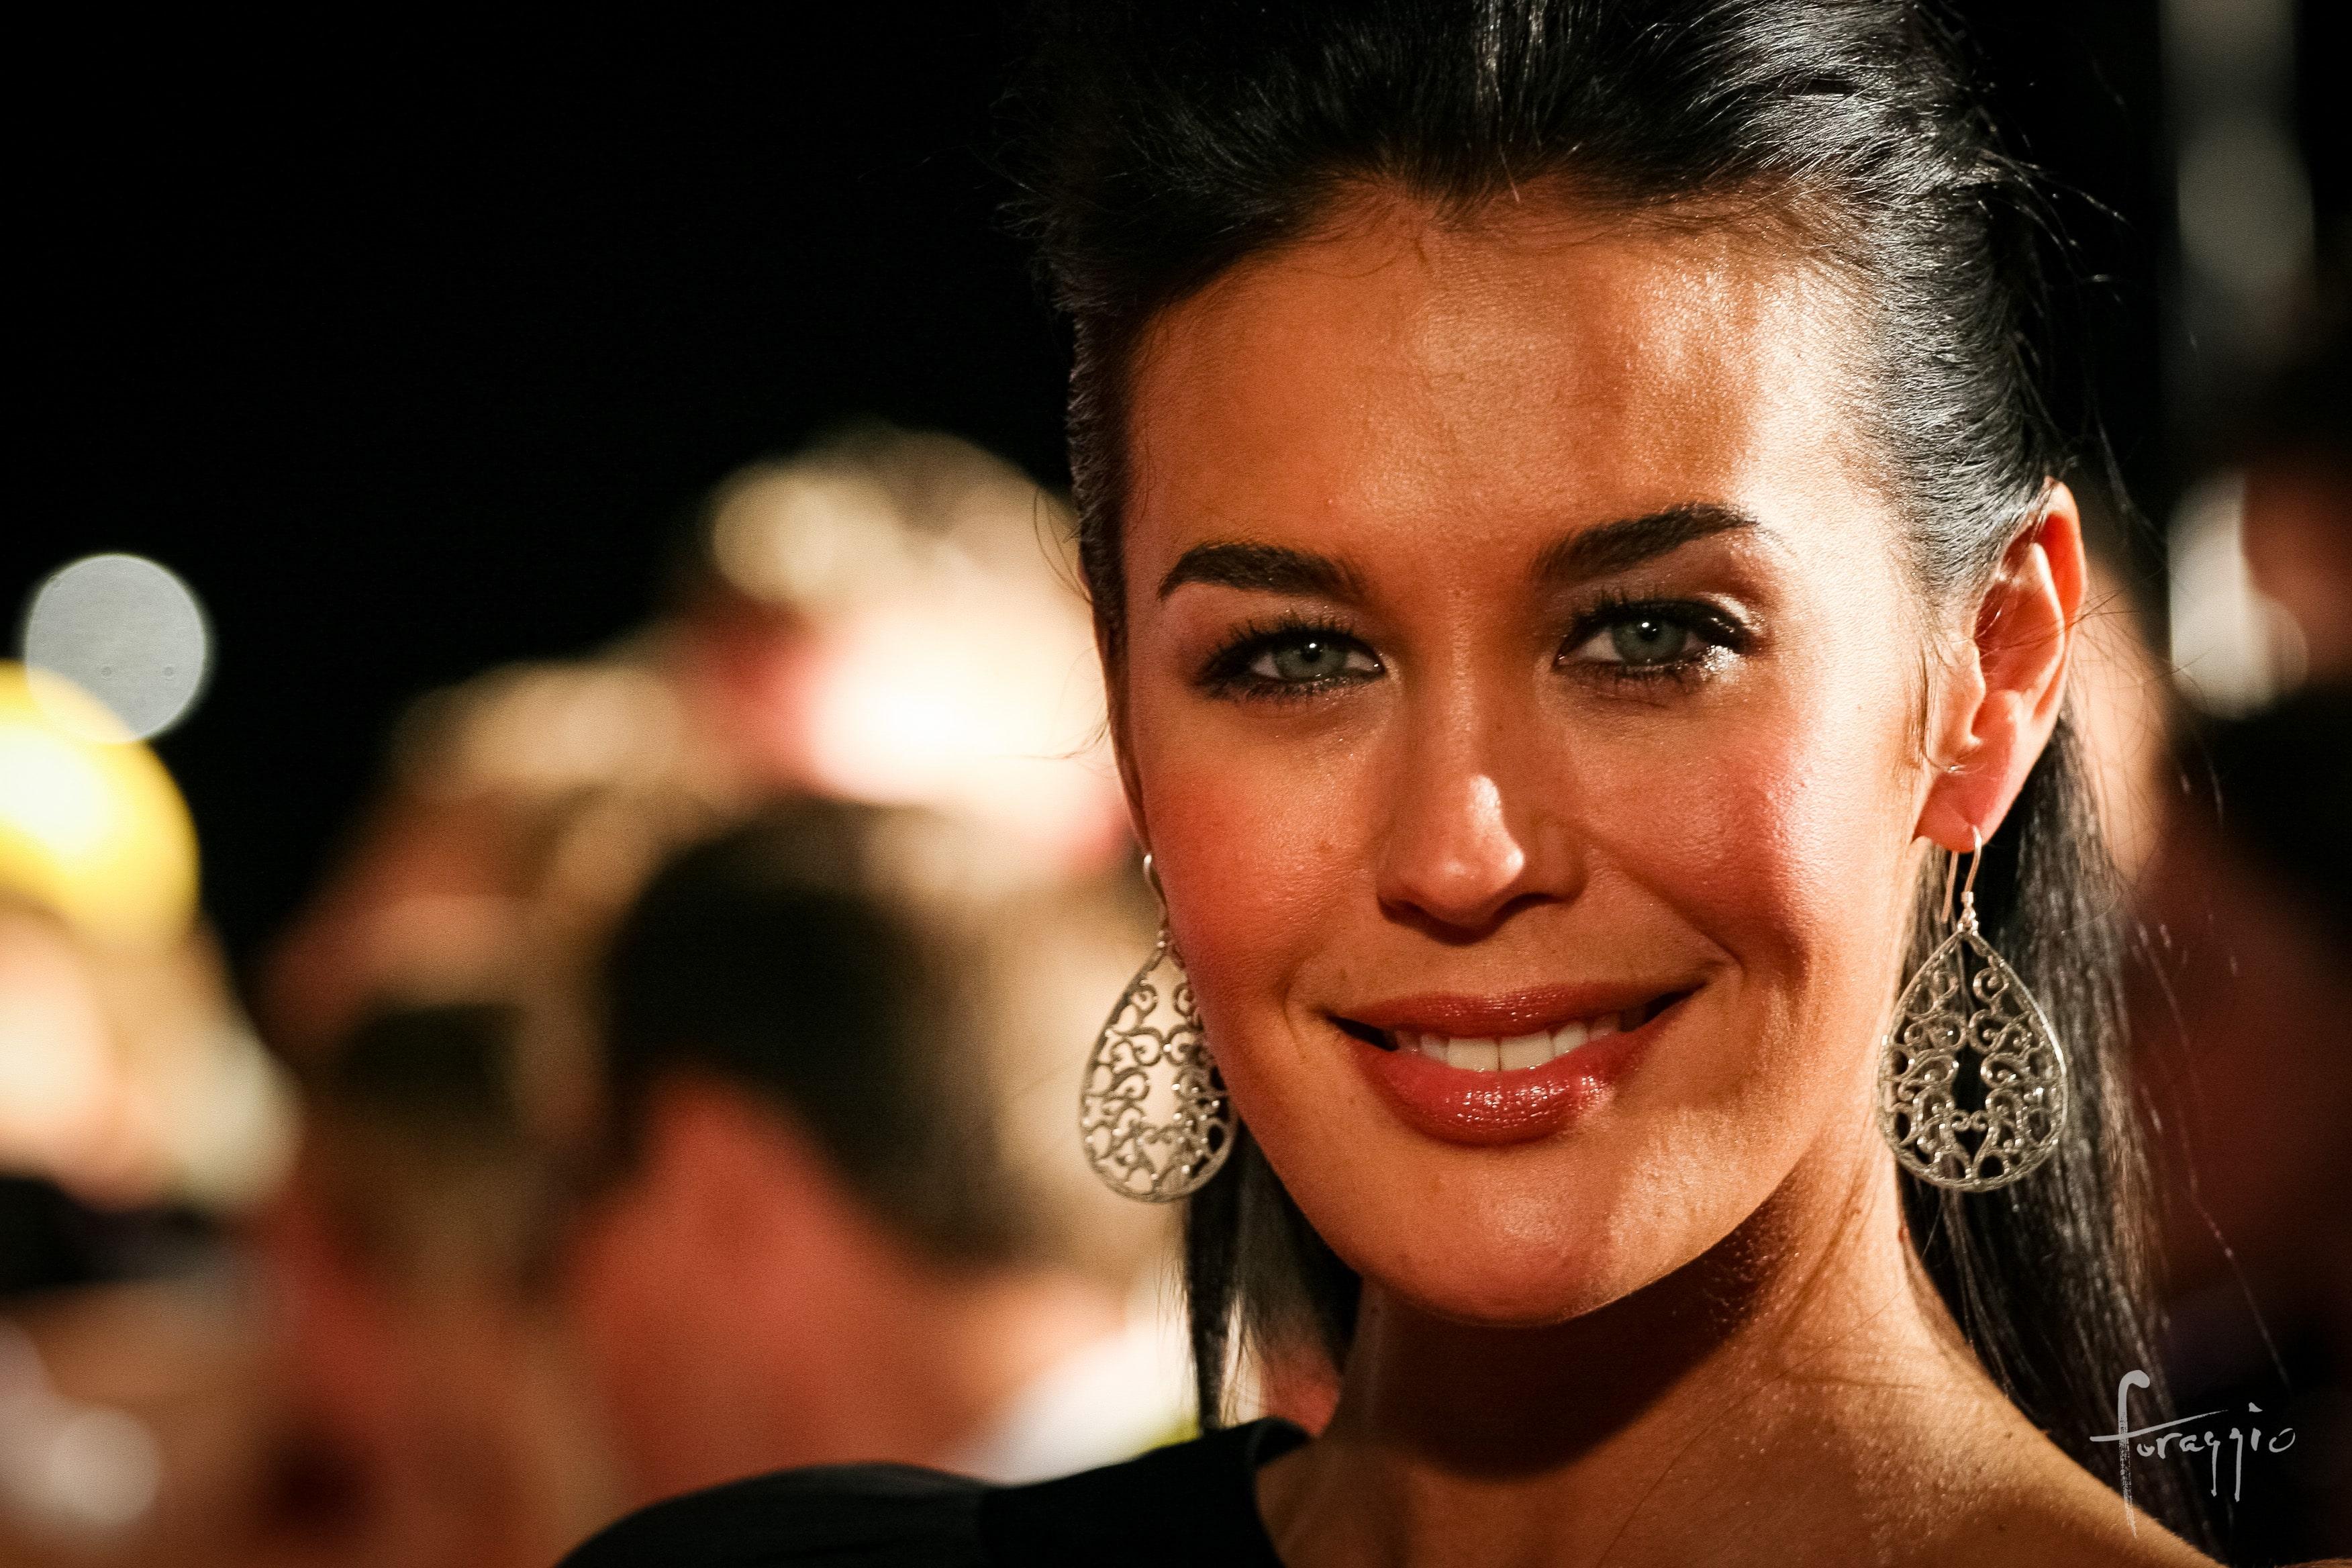 Australian supermodel Megan Gale on the red carpet | Foraggio Photographic